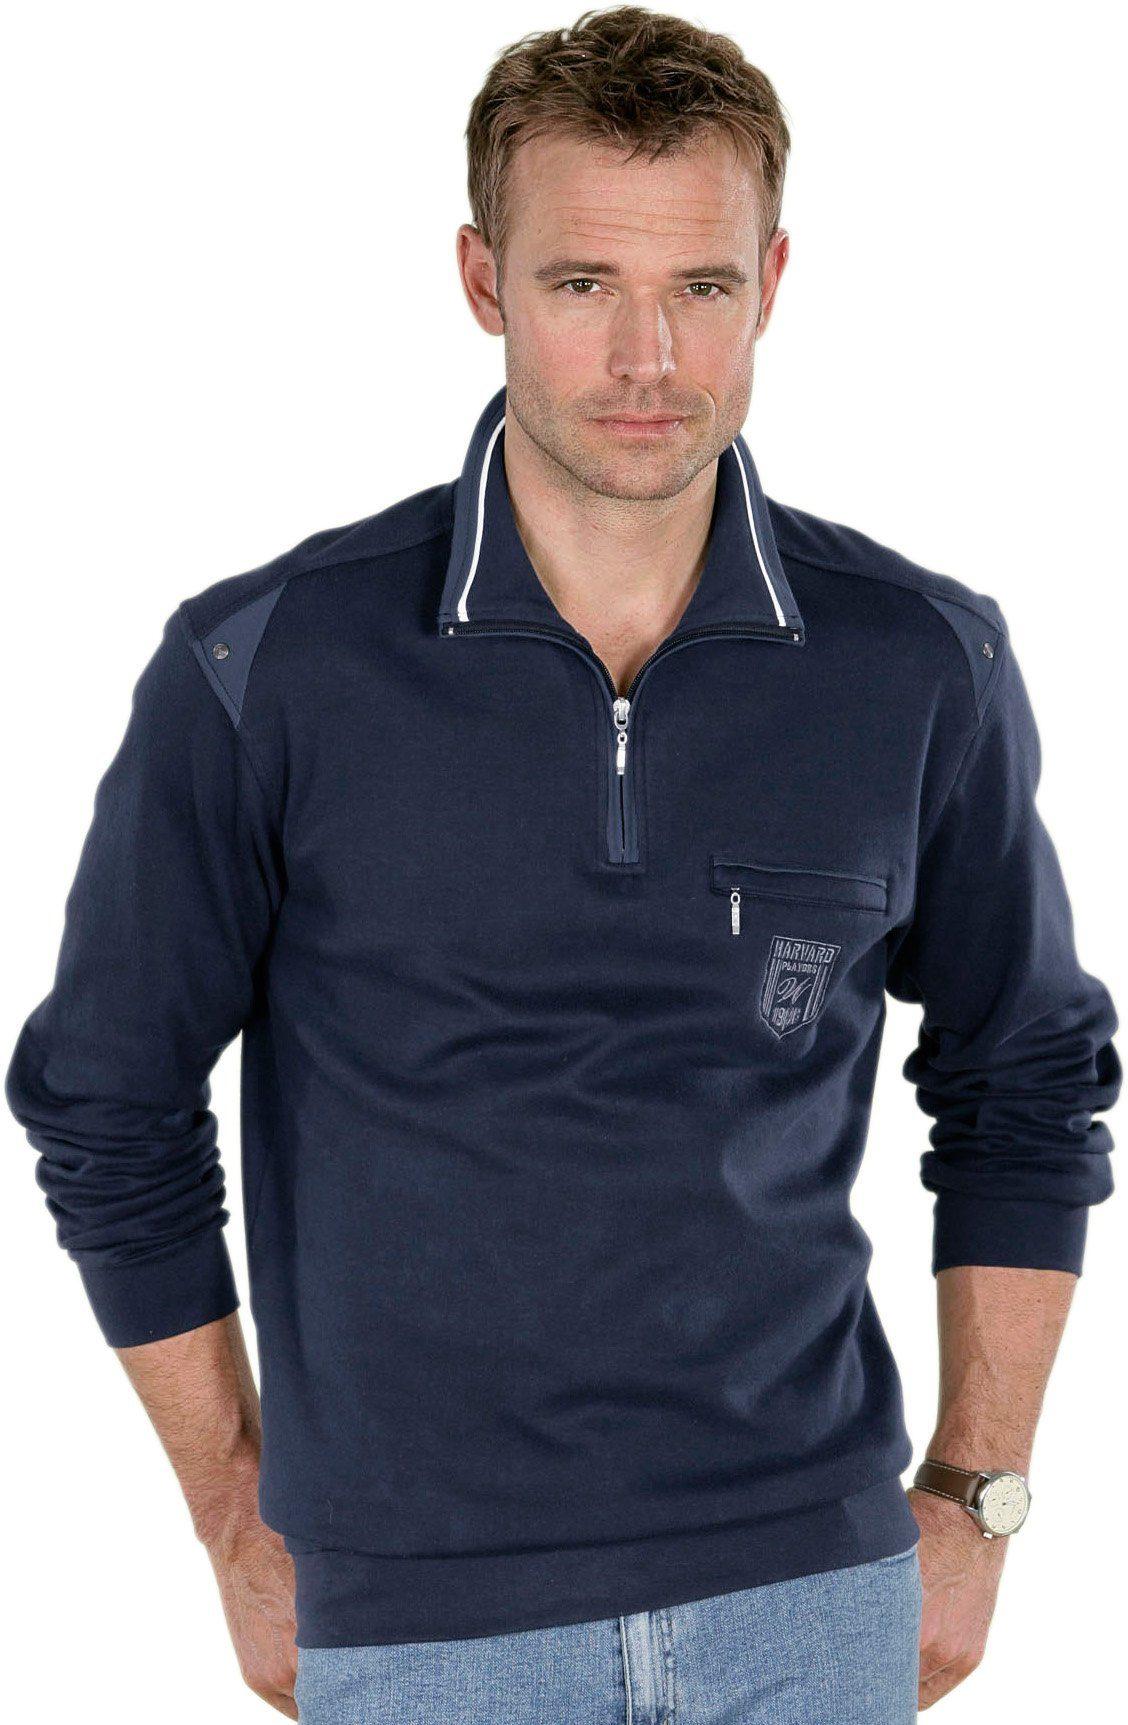 Kaufen Sweatshirt Online Mit Stickerei Classic PukOTXZi